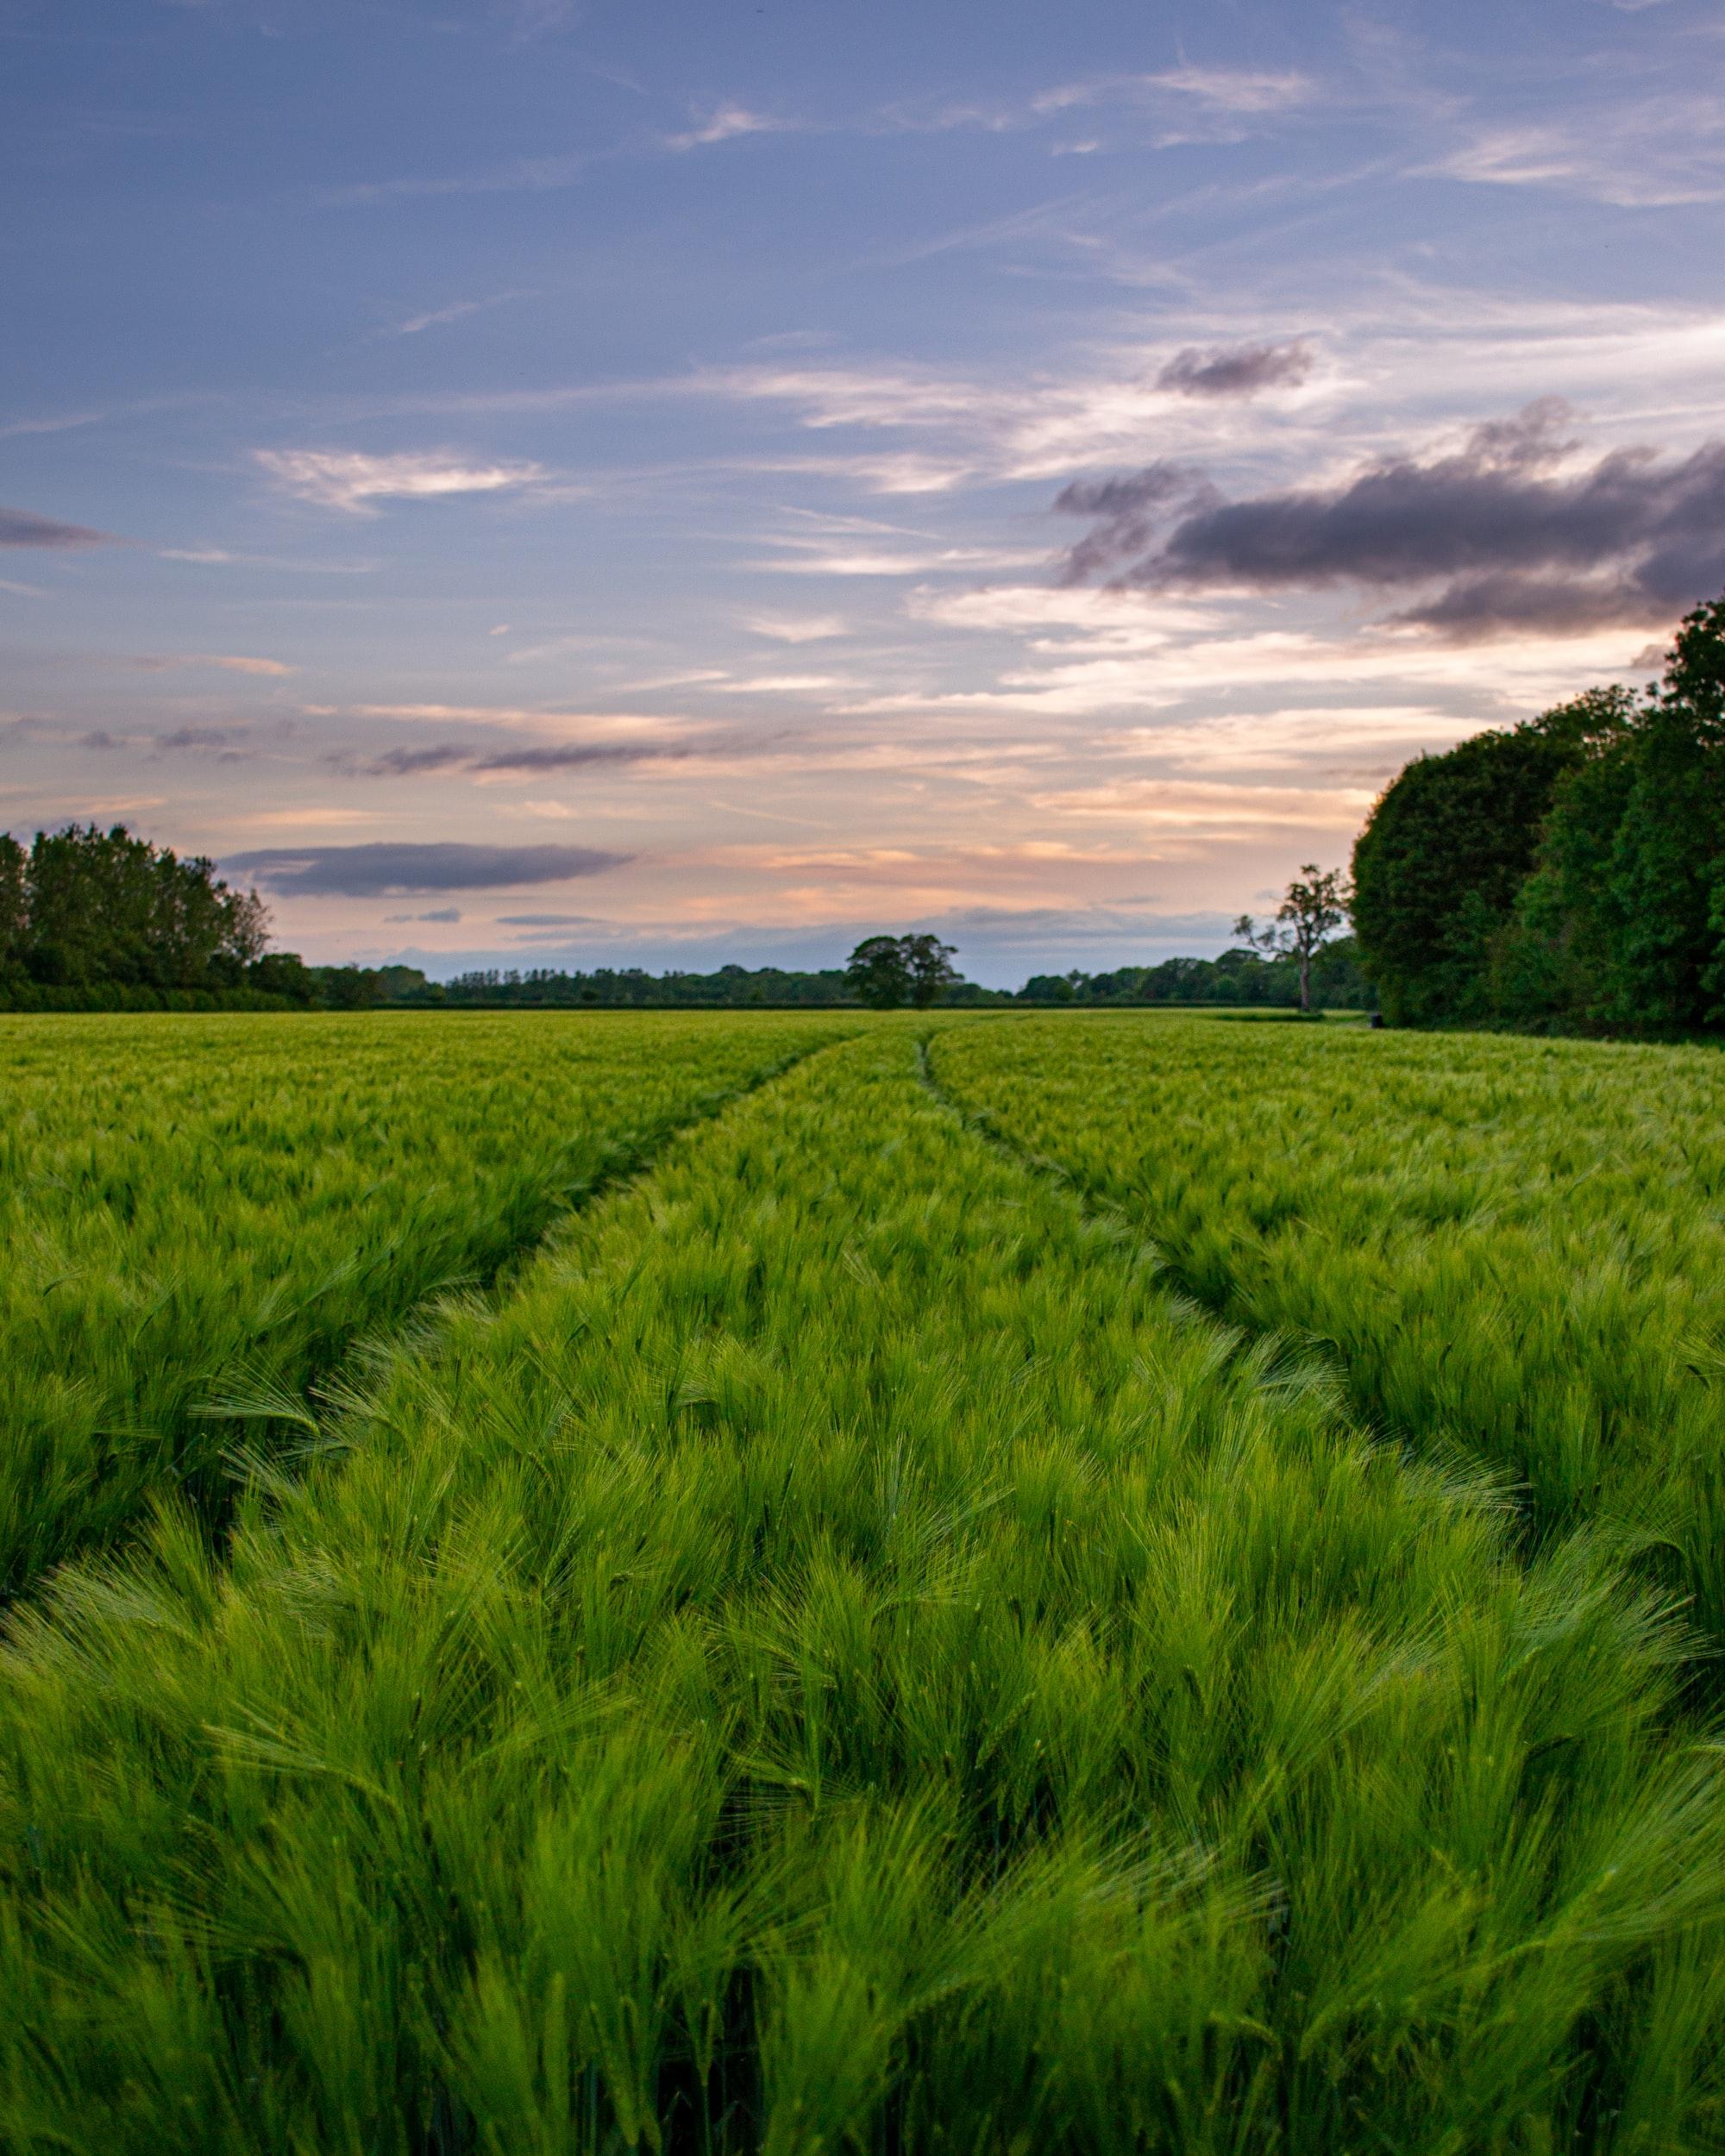 English Countryside, English Field, Farmers Field, Lone Tree, Barley Field, Sunset, English Sunset